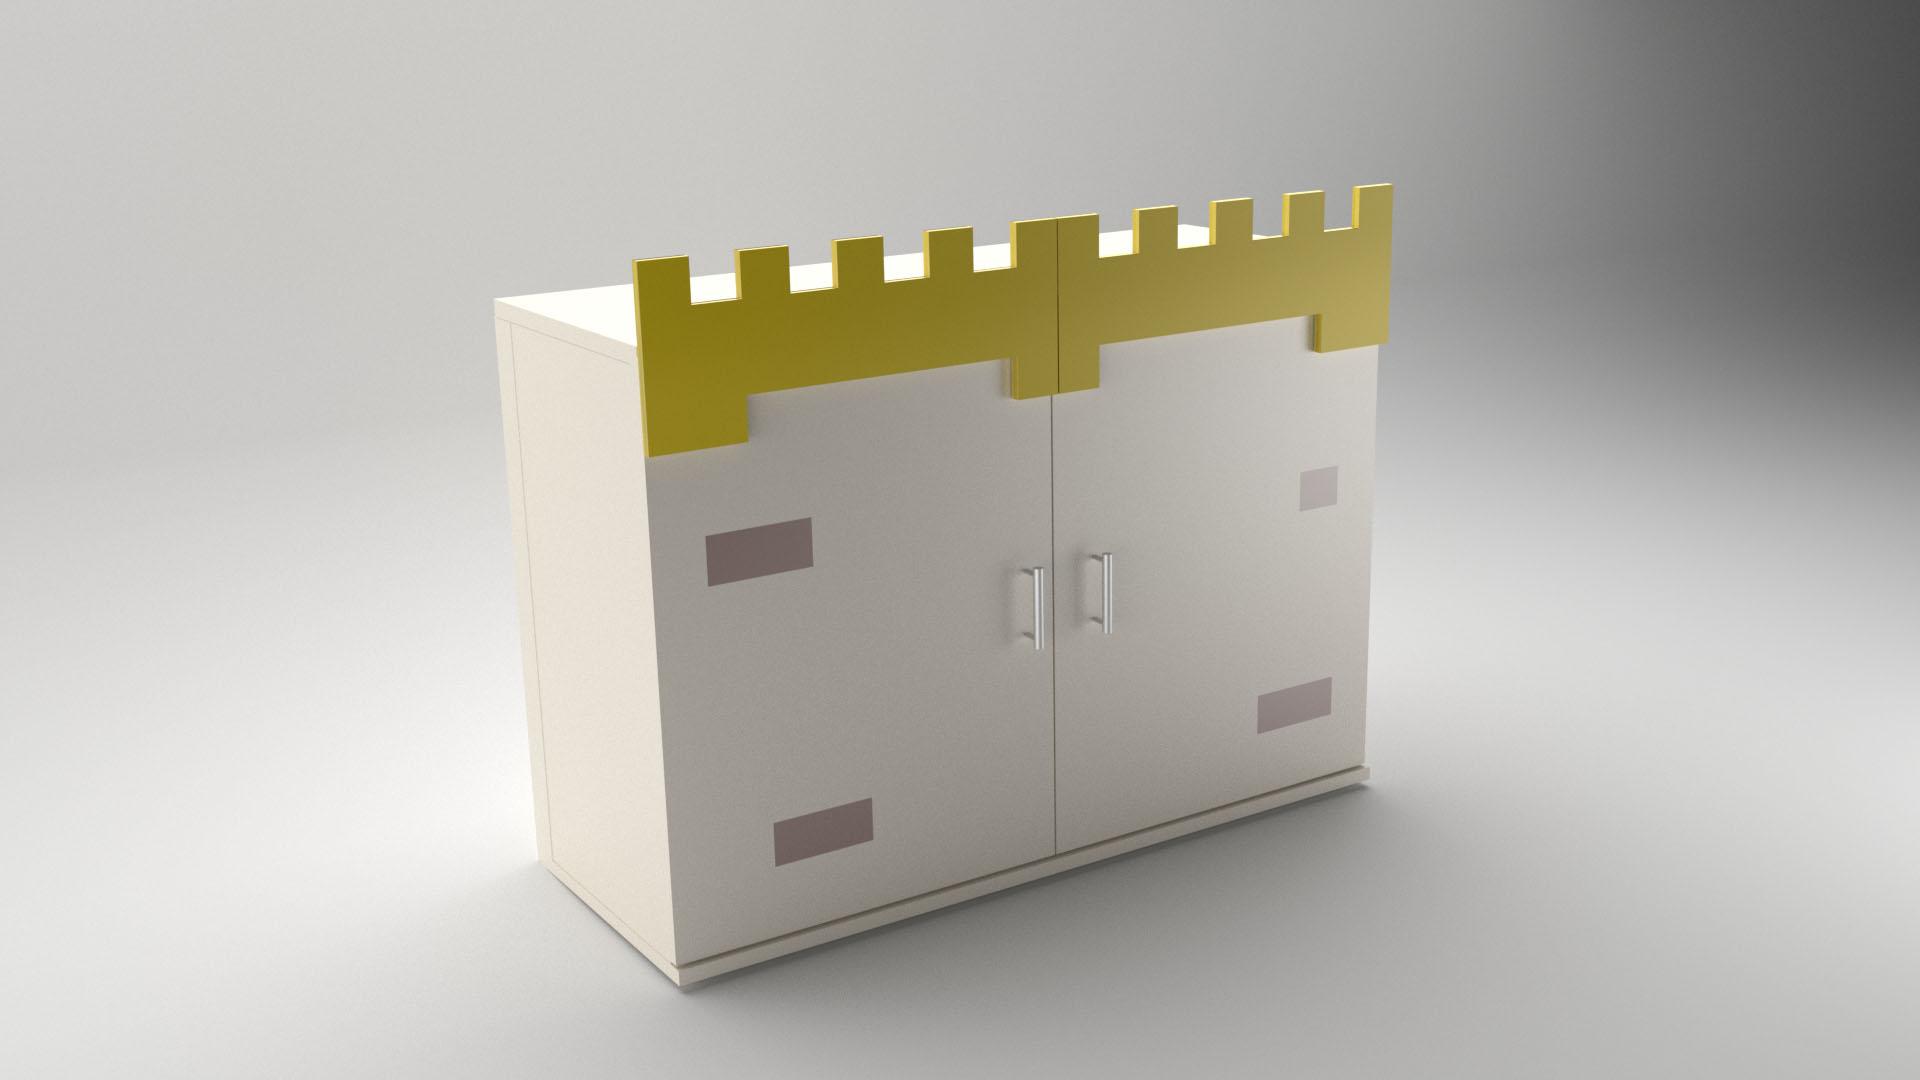 Model Camelot Gate Vista 2